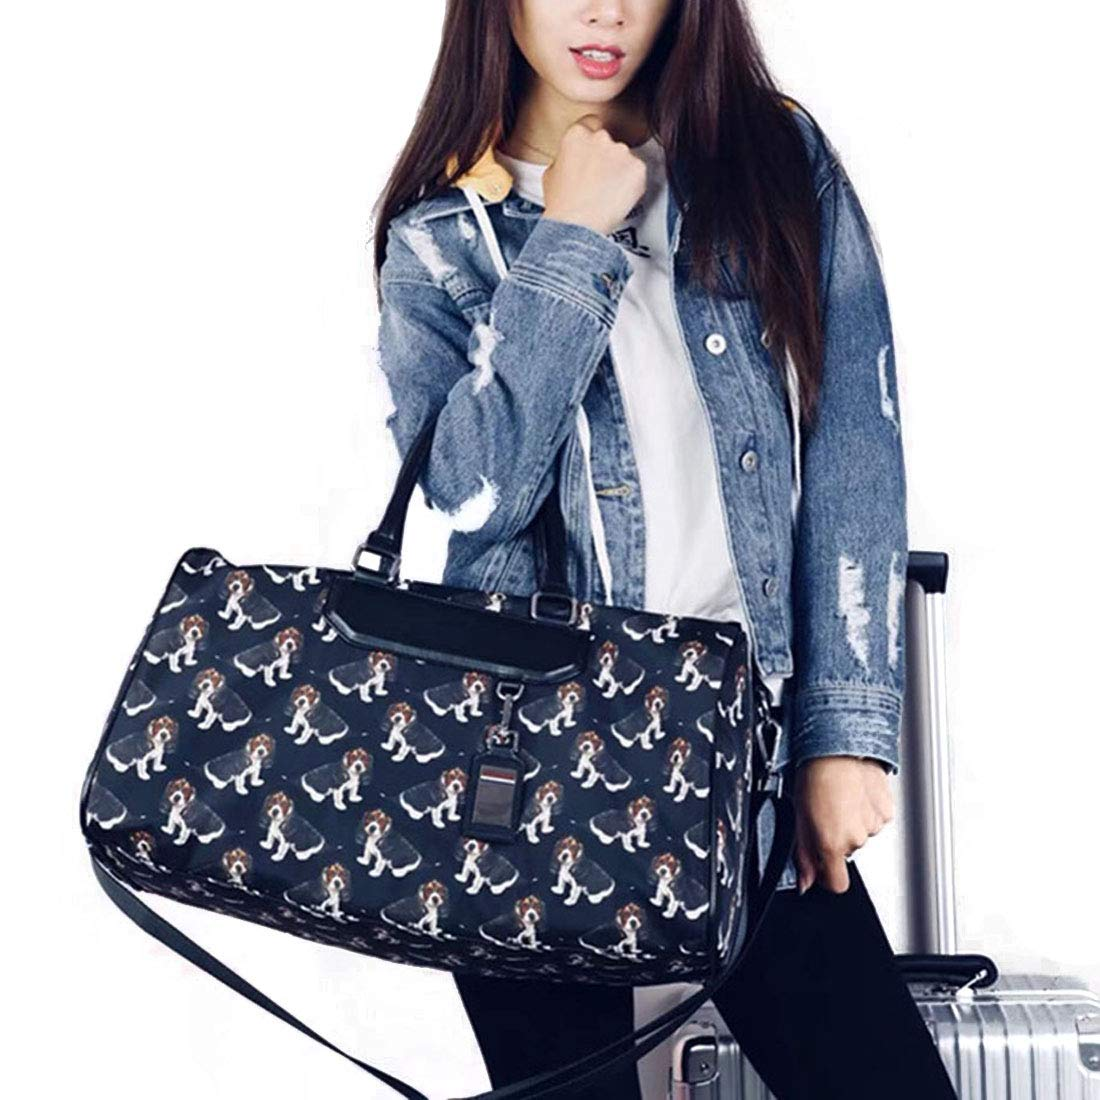 MATCHANT Short Trip Package Puppy Flower Travel Bag Hand Bag Gym Bag Outdoor Handbags Casual Business Bag Shoulder Bag